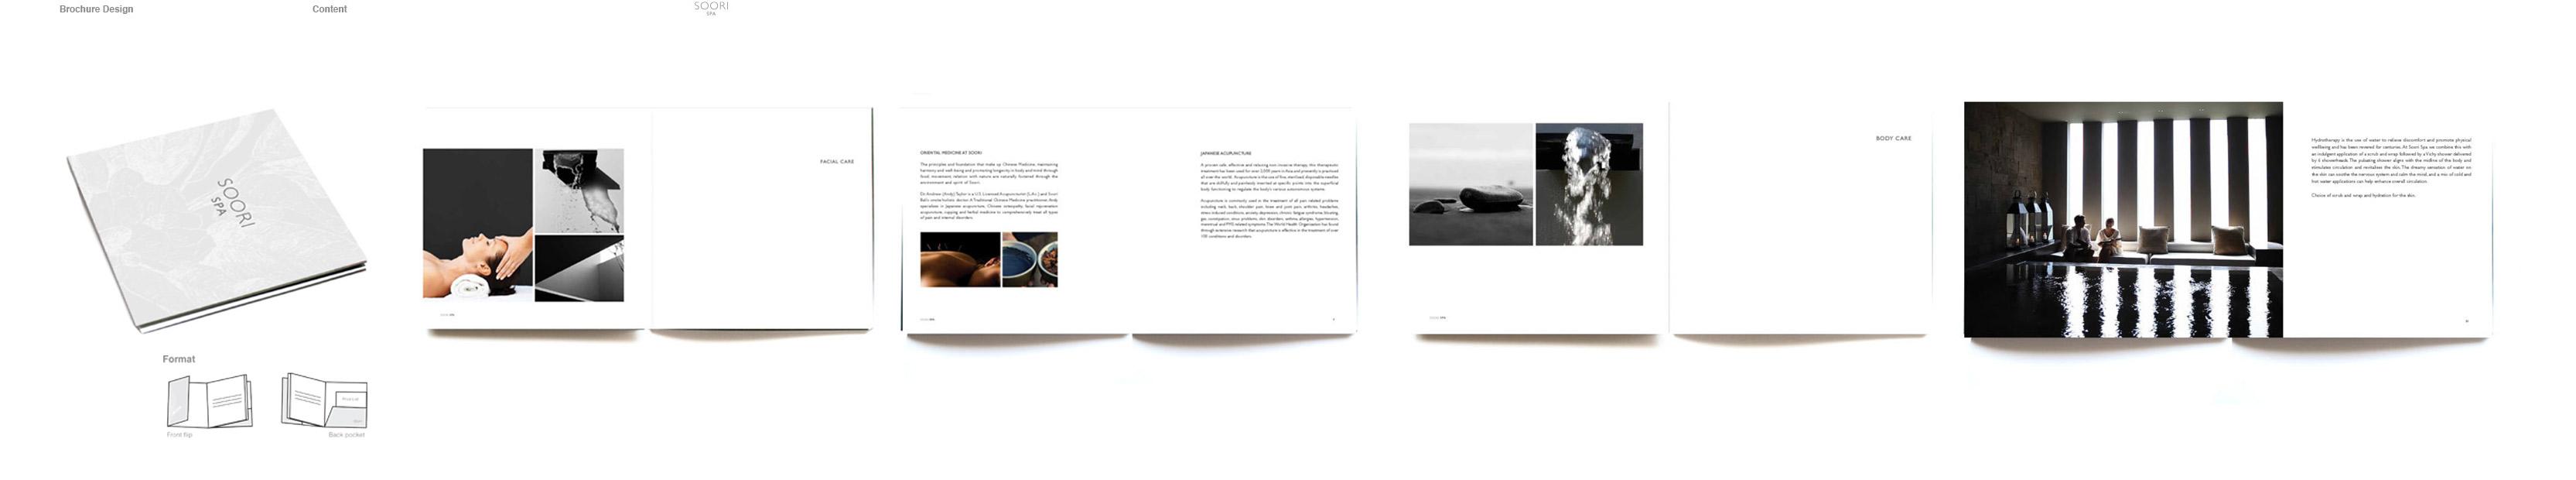 soori_portfolio_layout-5_copy